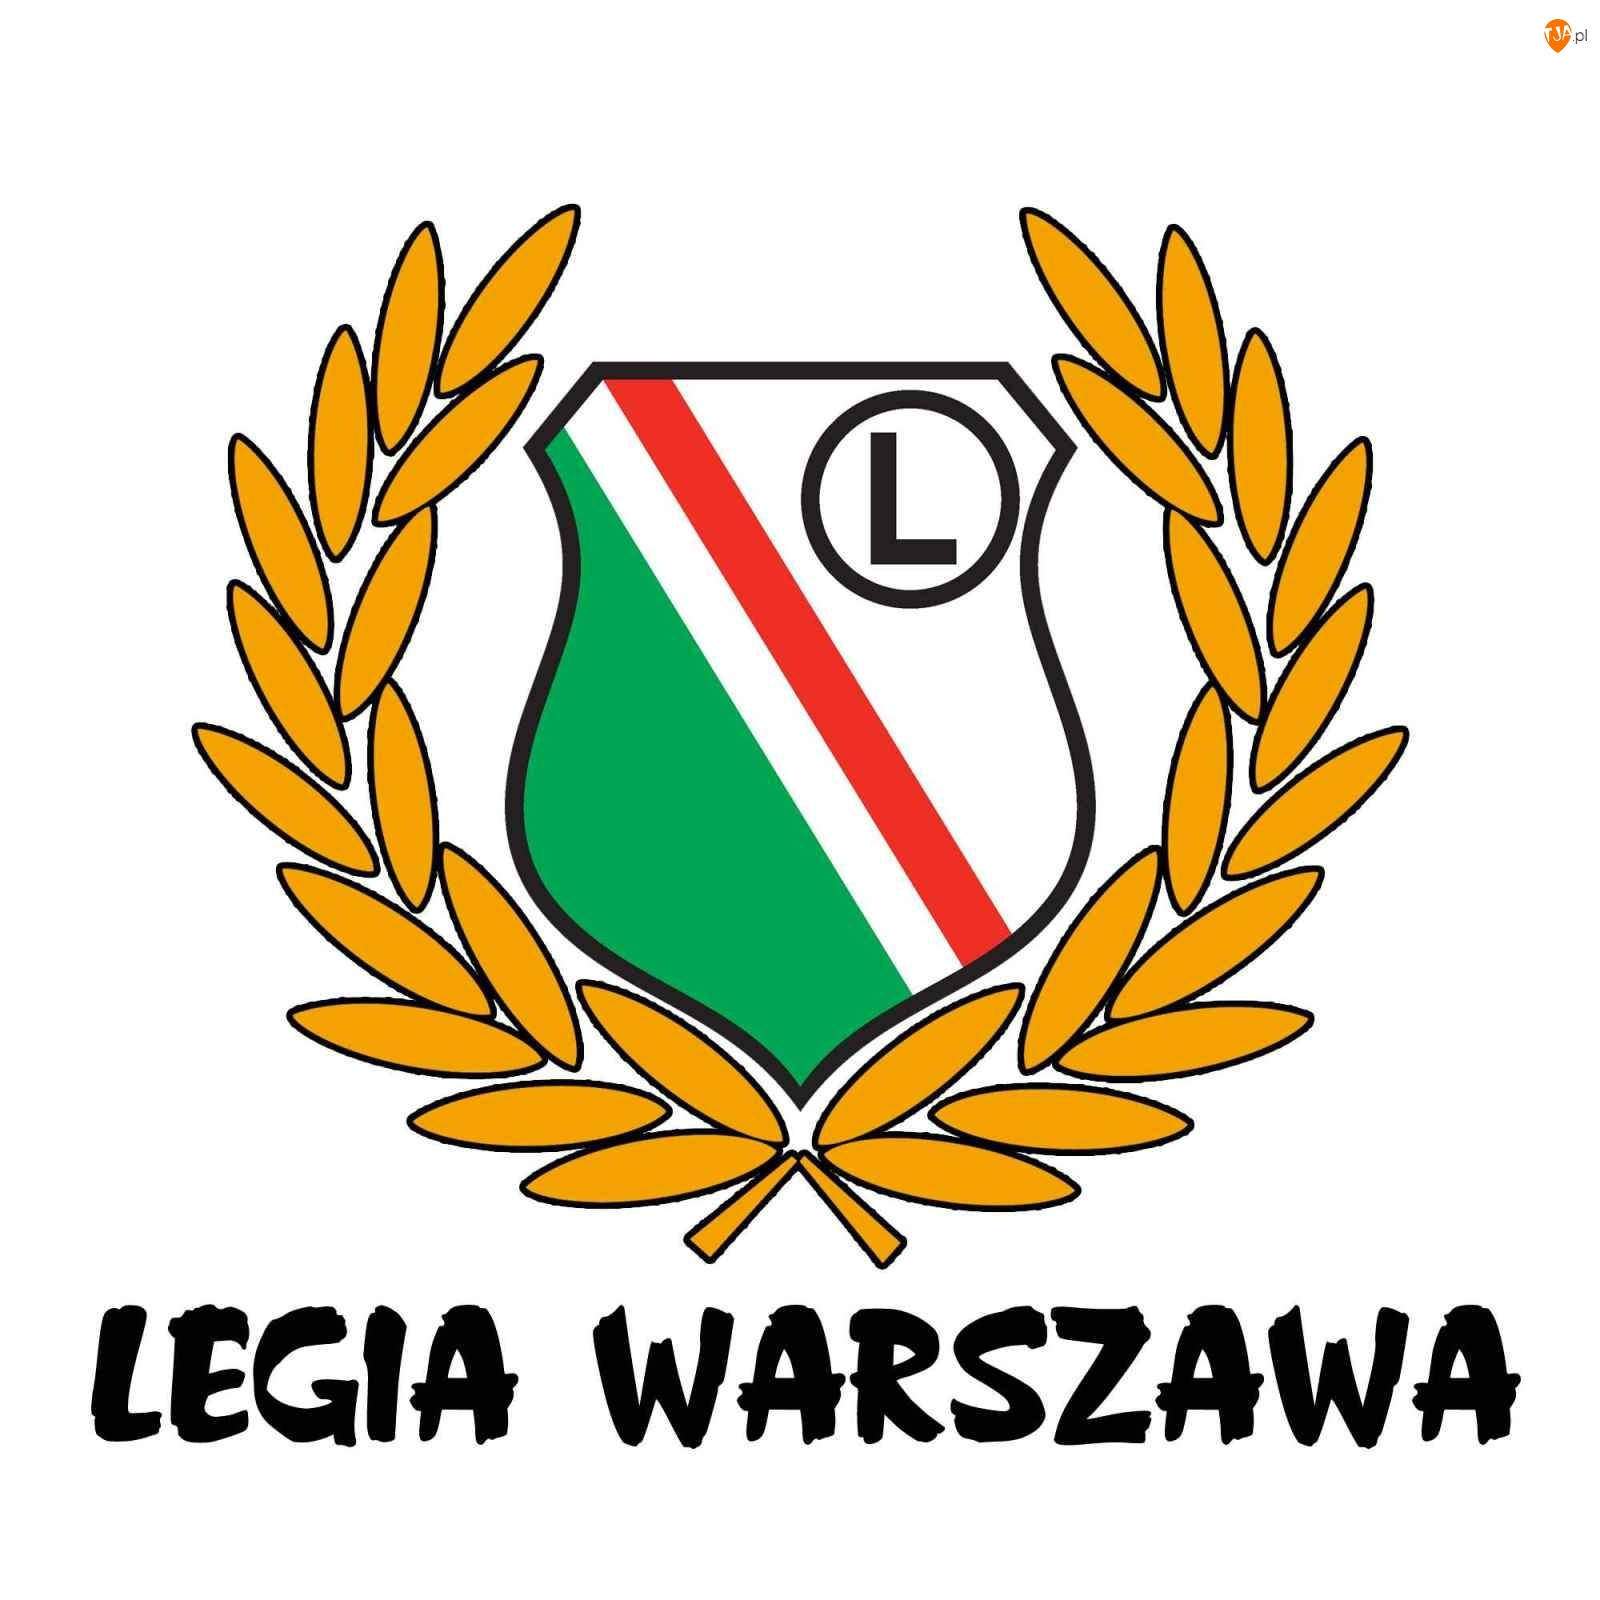 Herb, Legia Warszawa